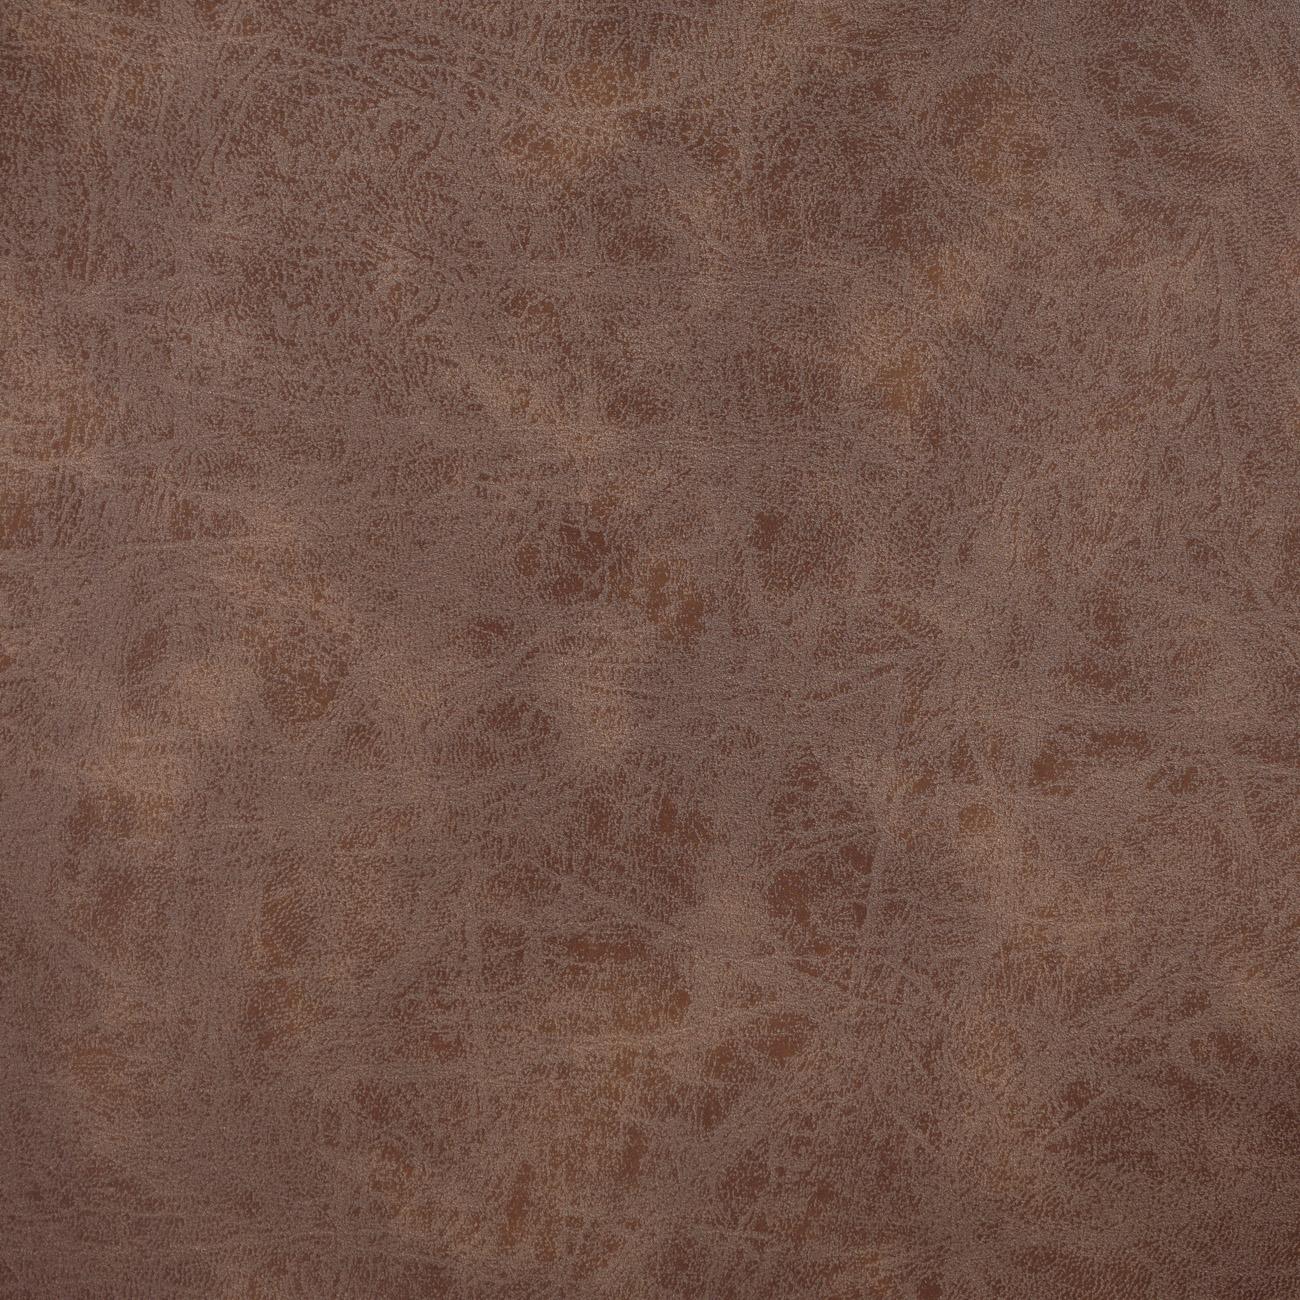 48-034-Faux-Leather-Linen-Storage-Ottoman-Footrest-Bench-Lift-Top thumbnail 26